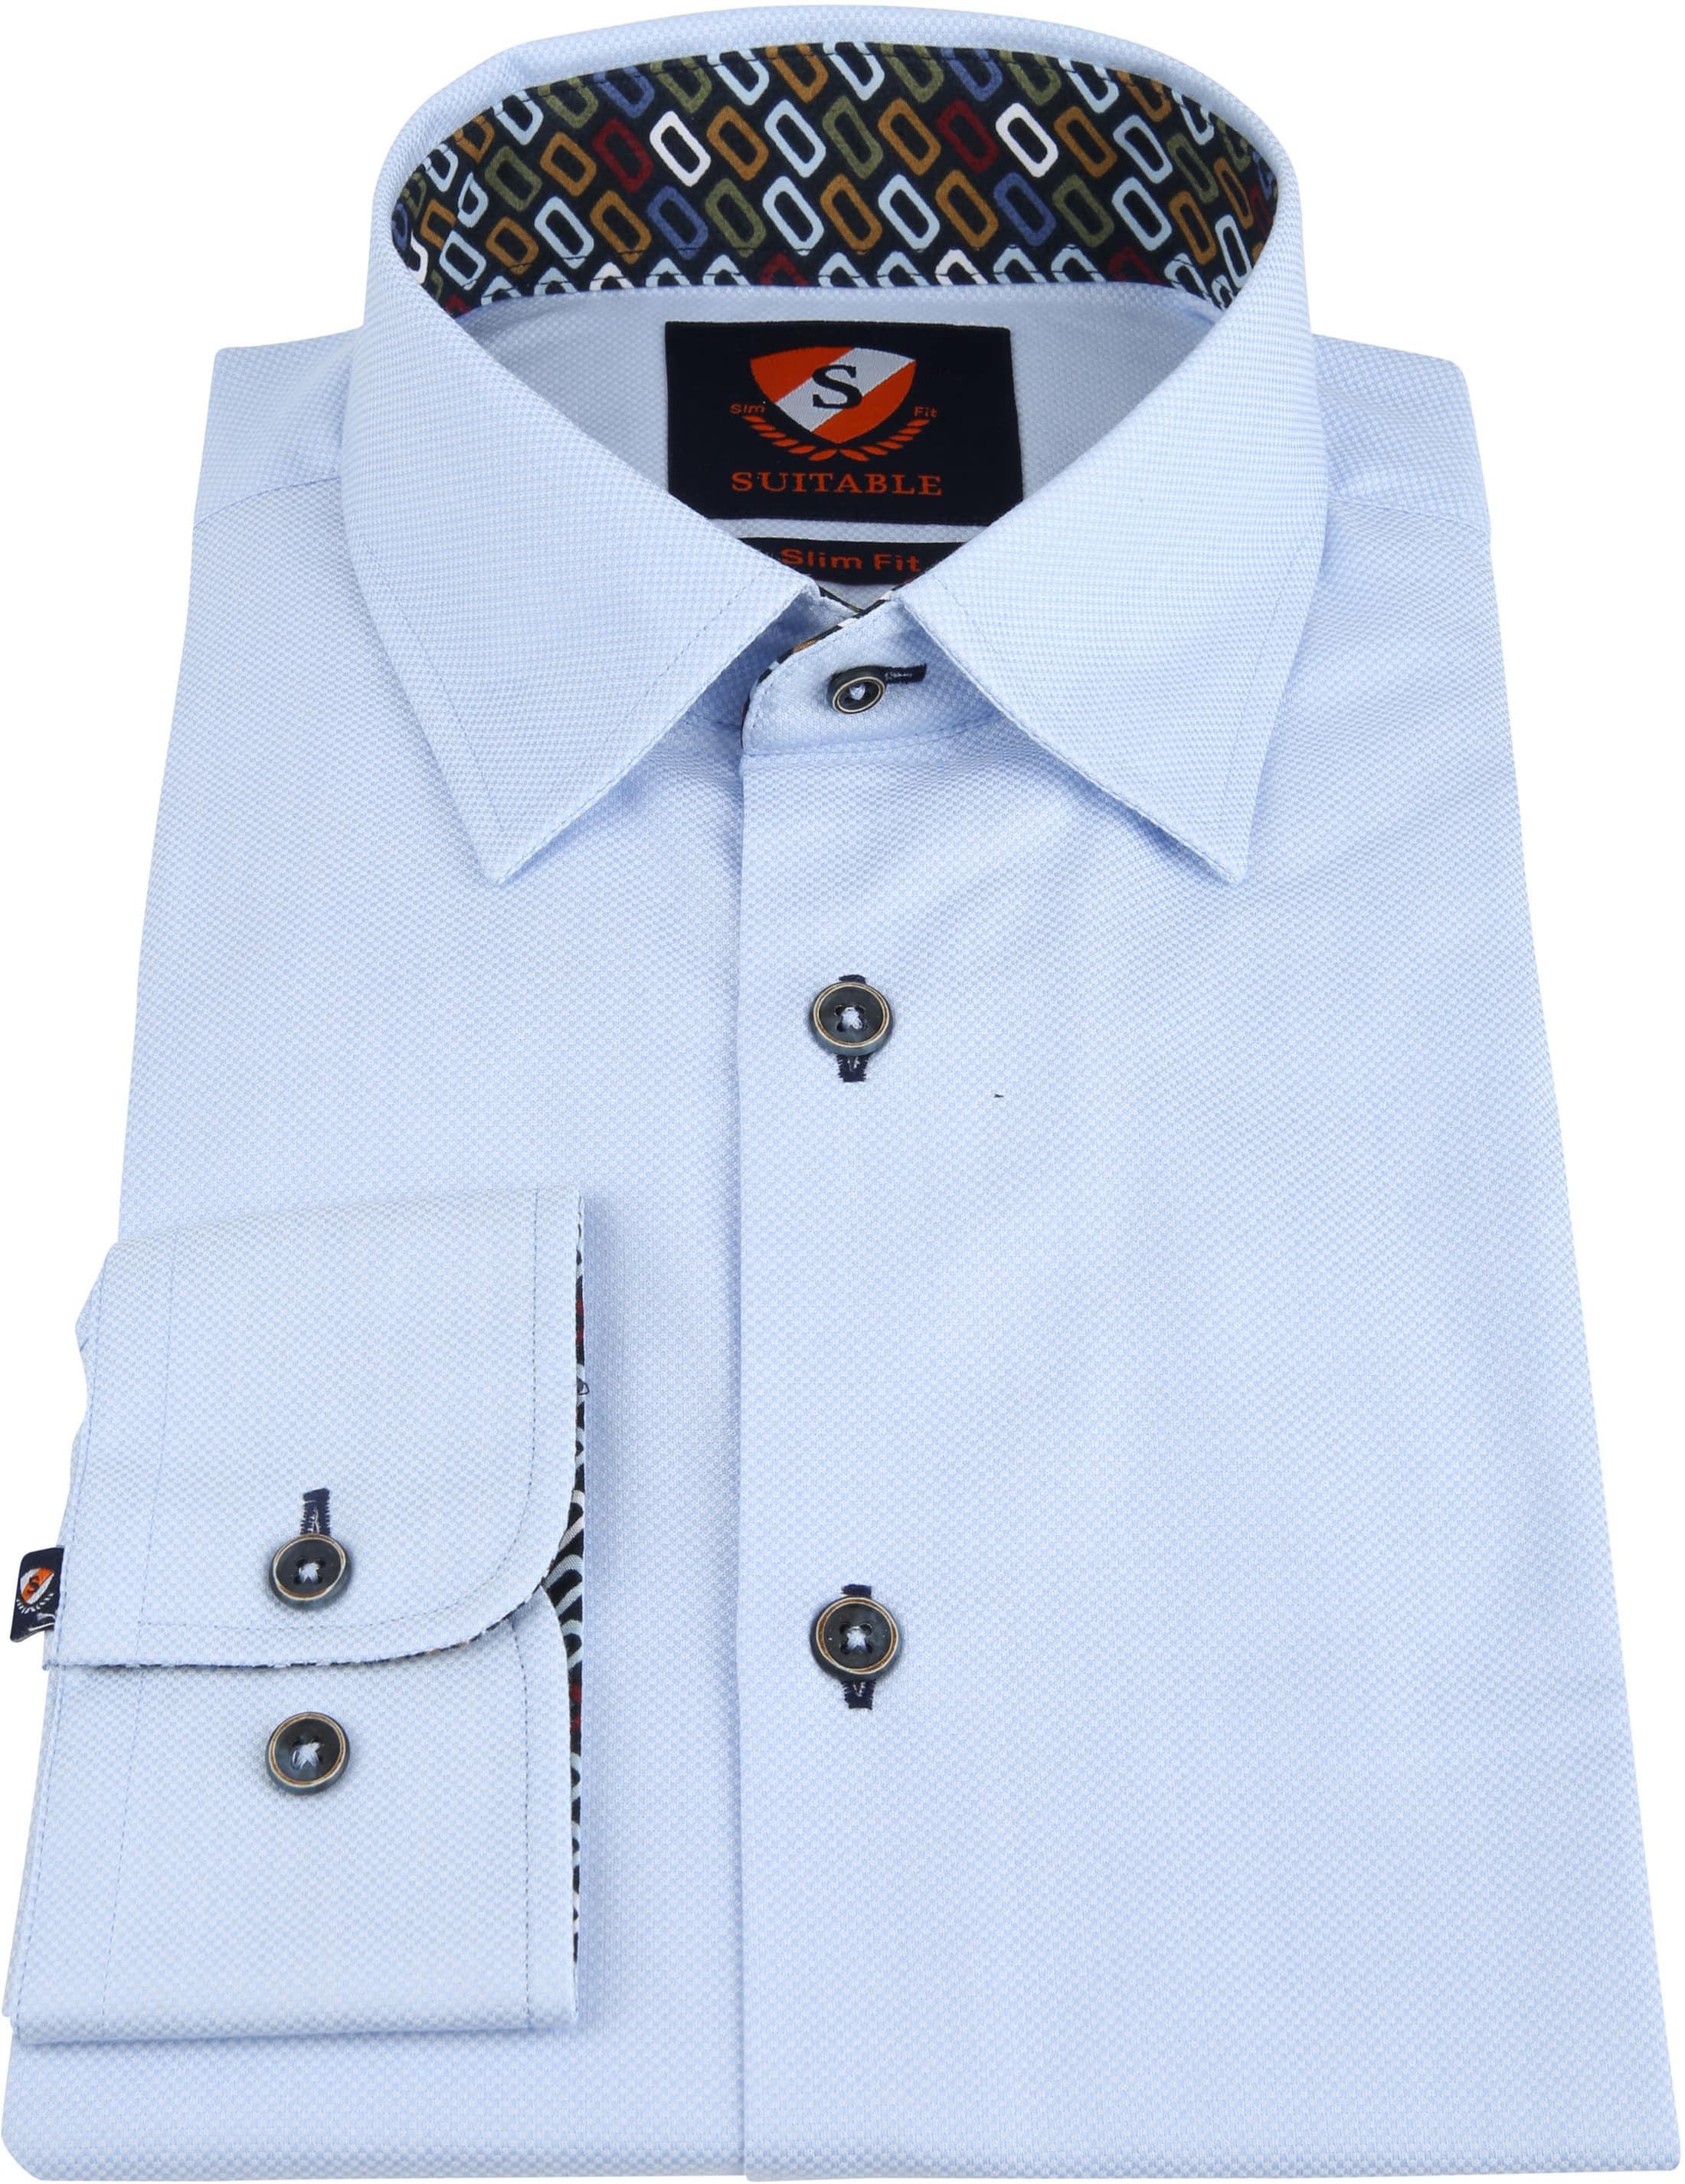 Suitable Wesley Shirt Light Blue photo 2